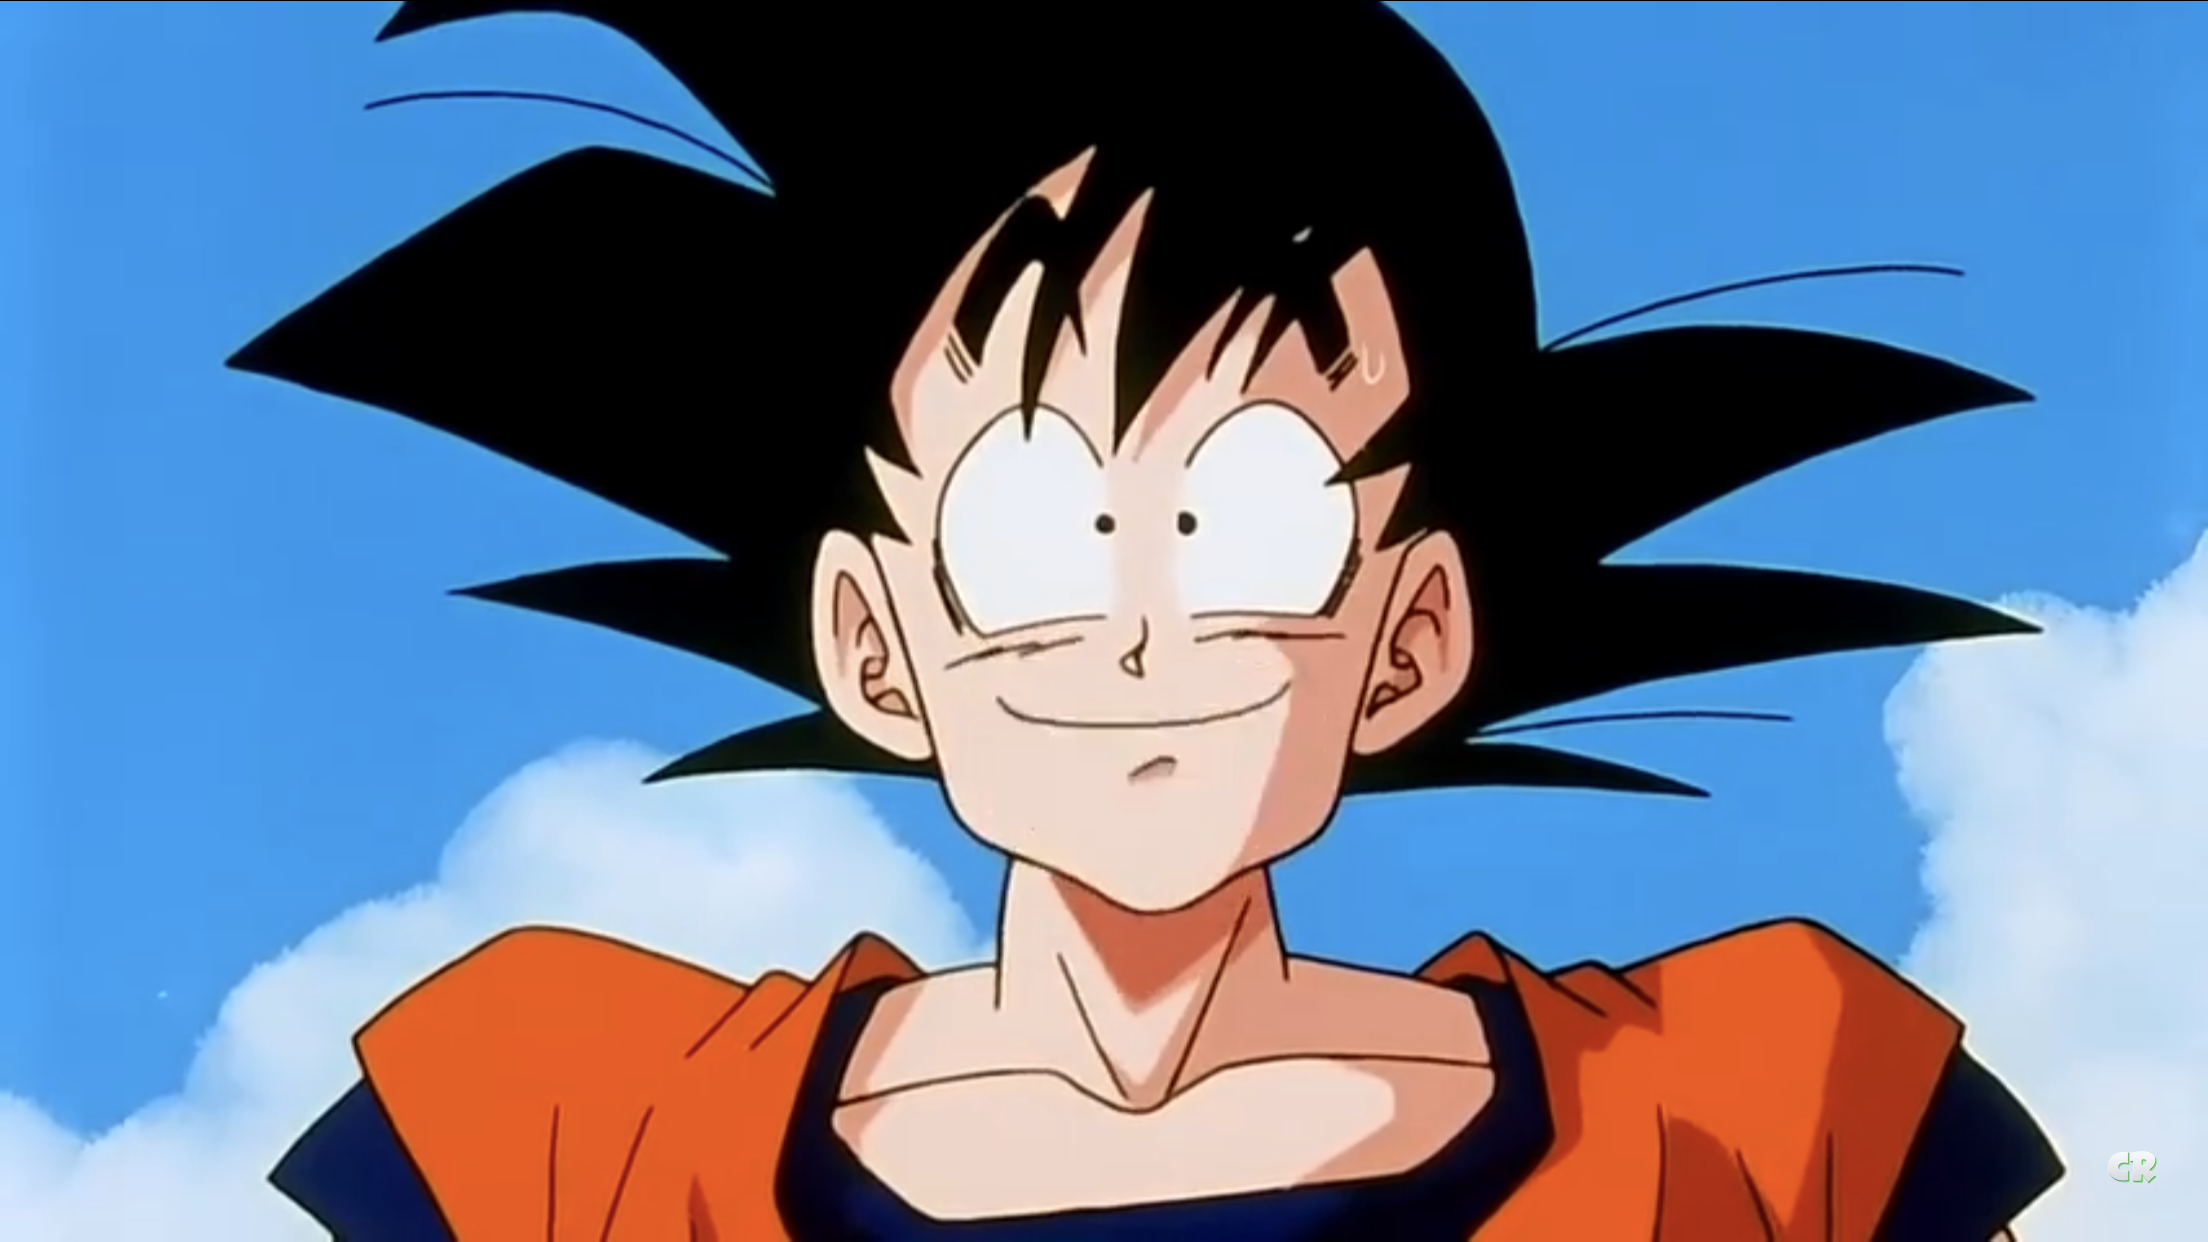 What A Lovely Day It Is Dragon Ball Super Goku Super Saiyan Blue Goku